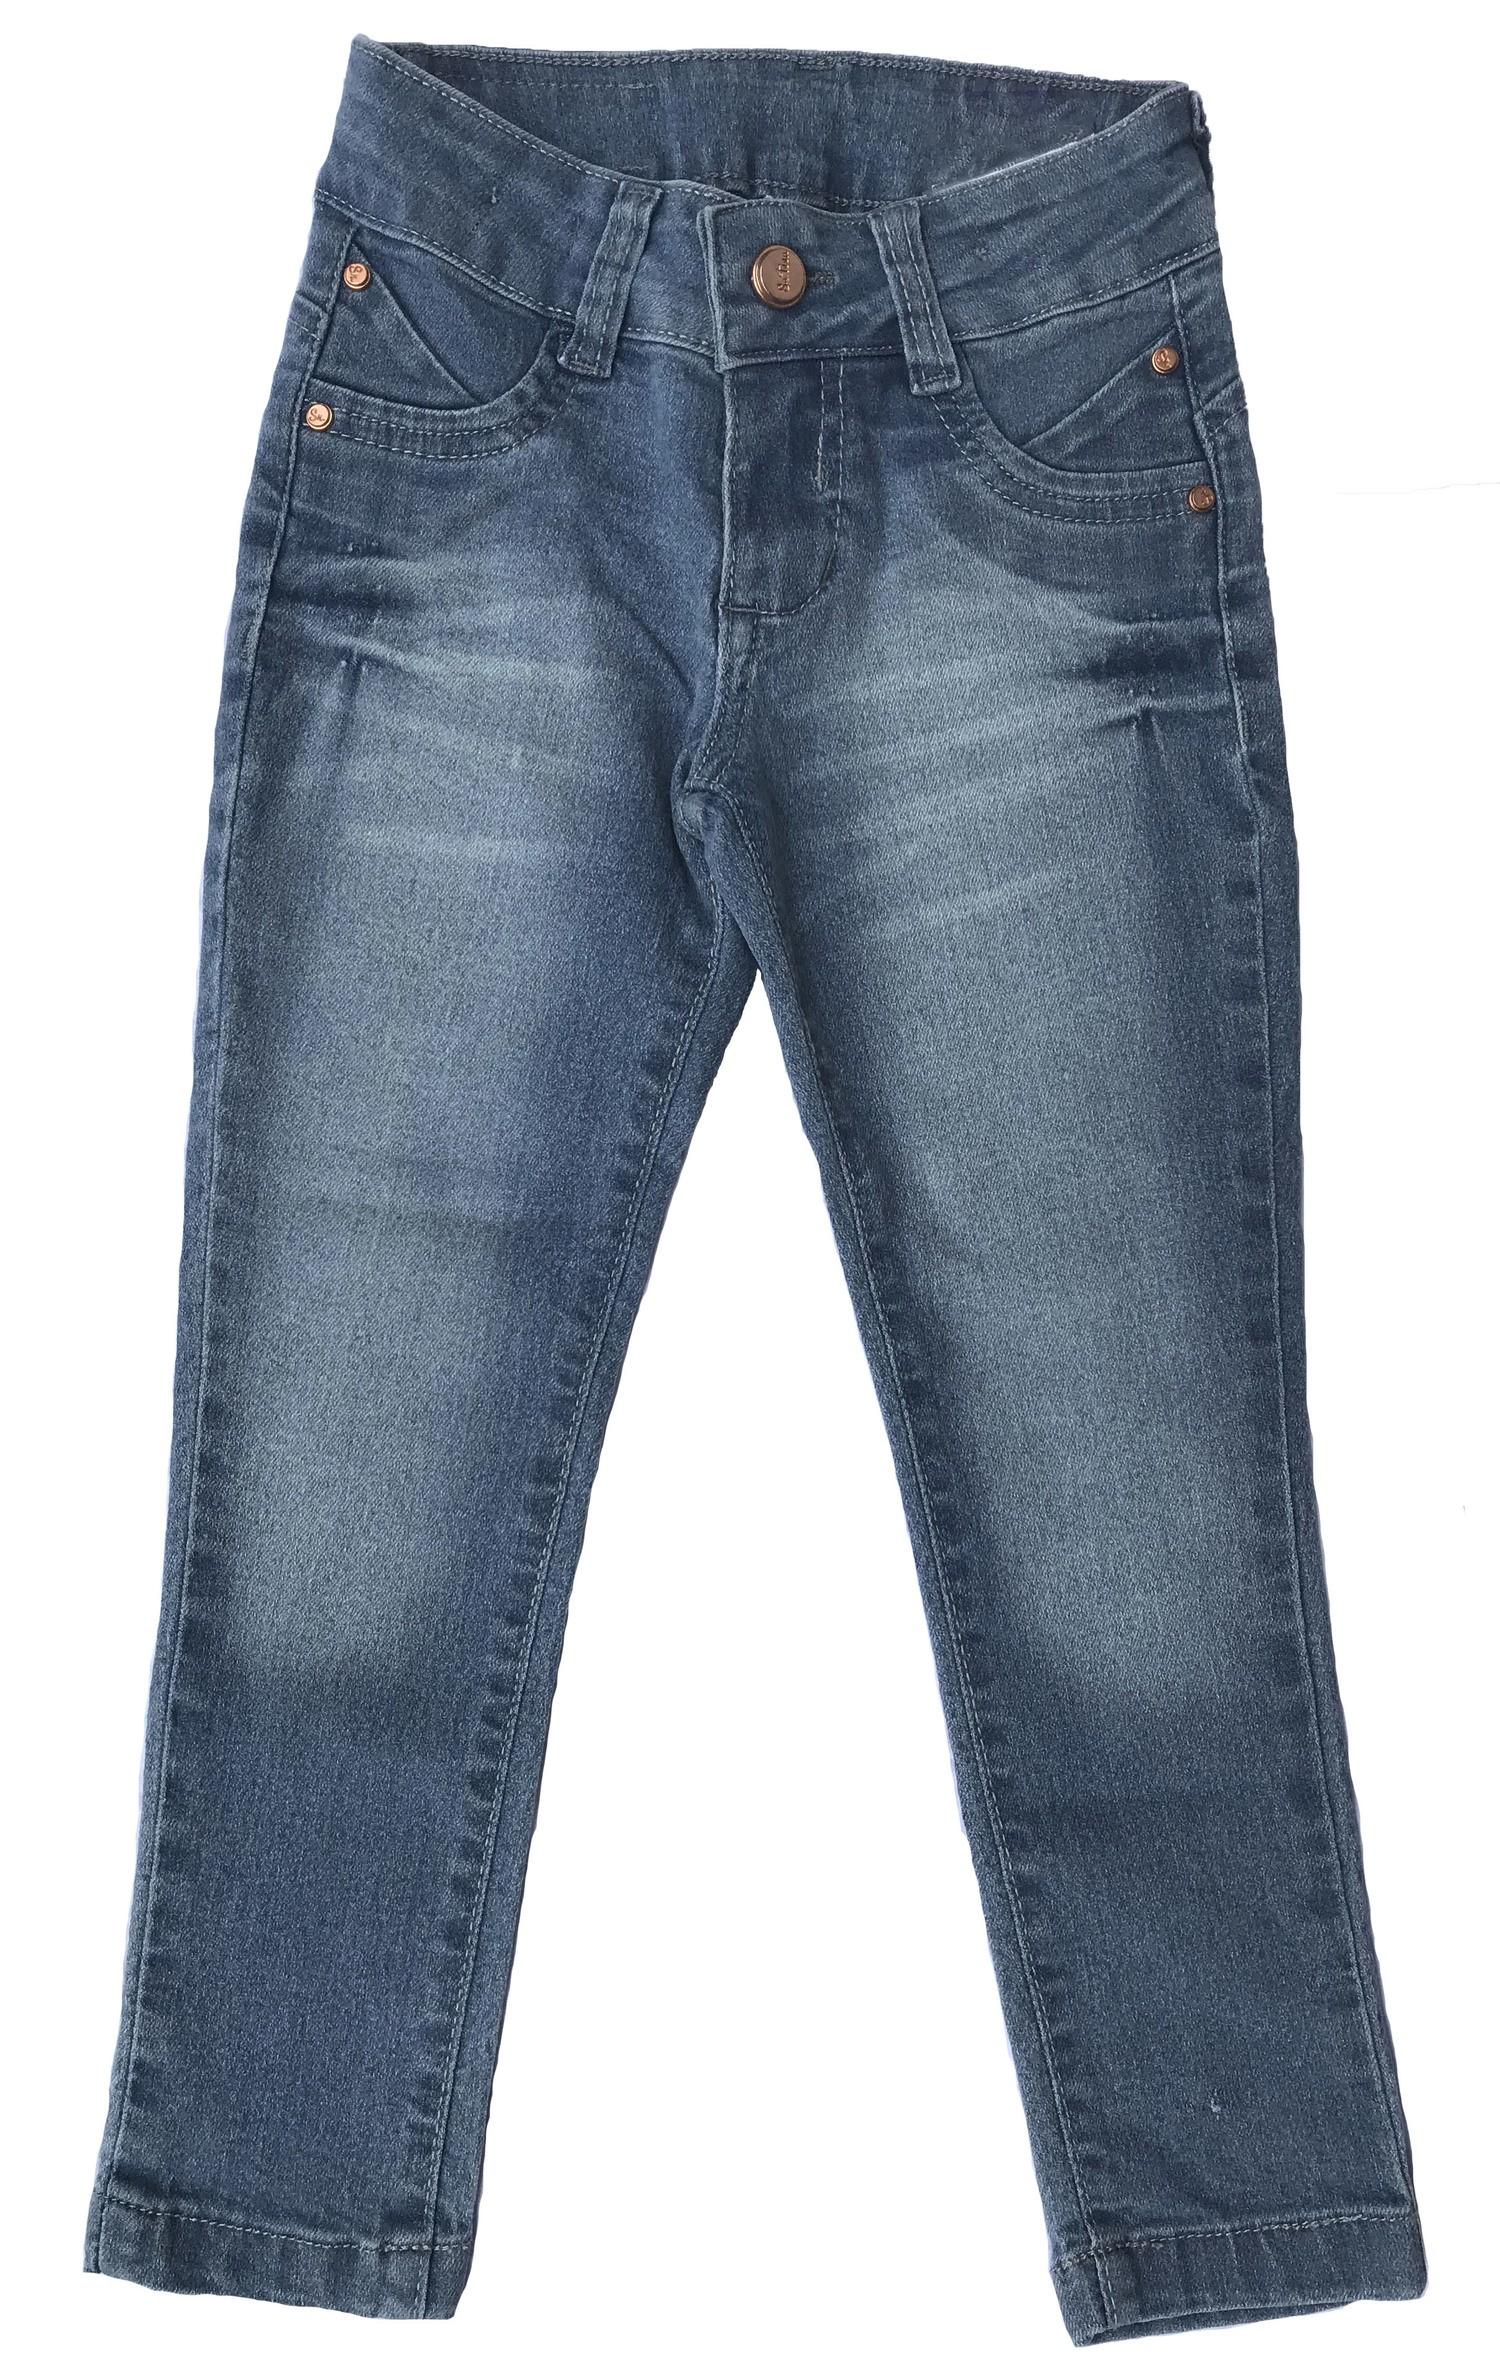 Calça Jeans Feminina [TV003]